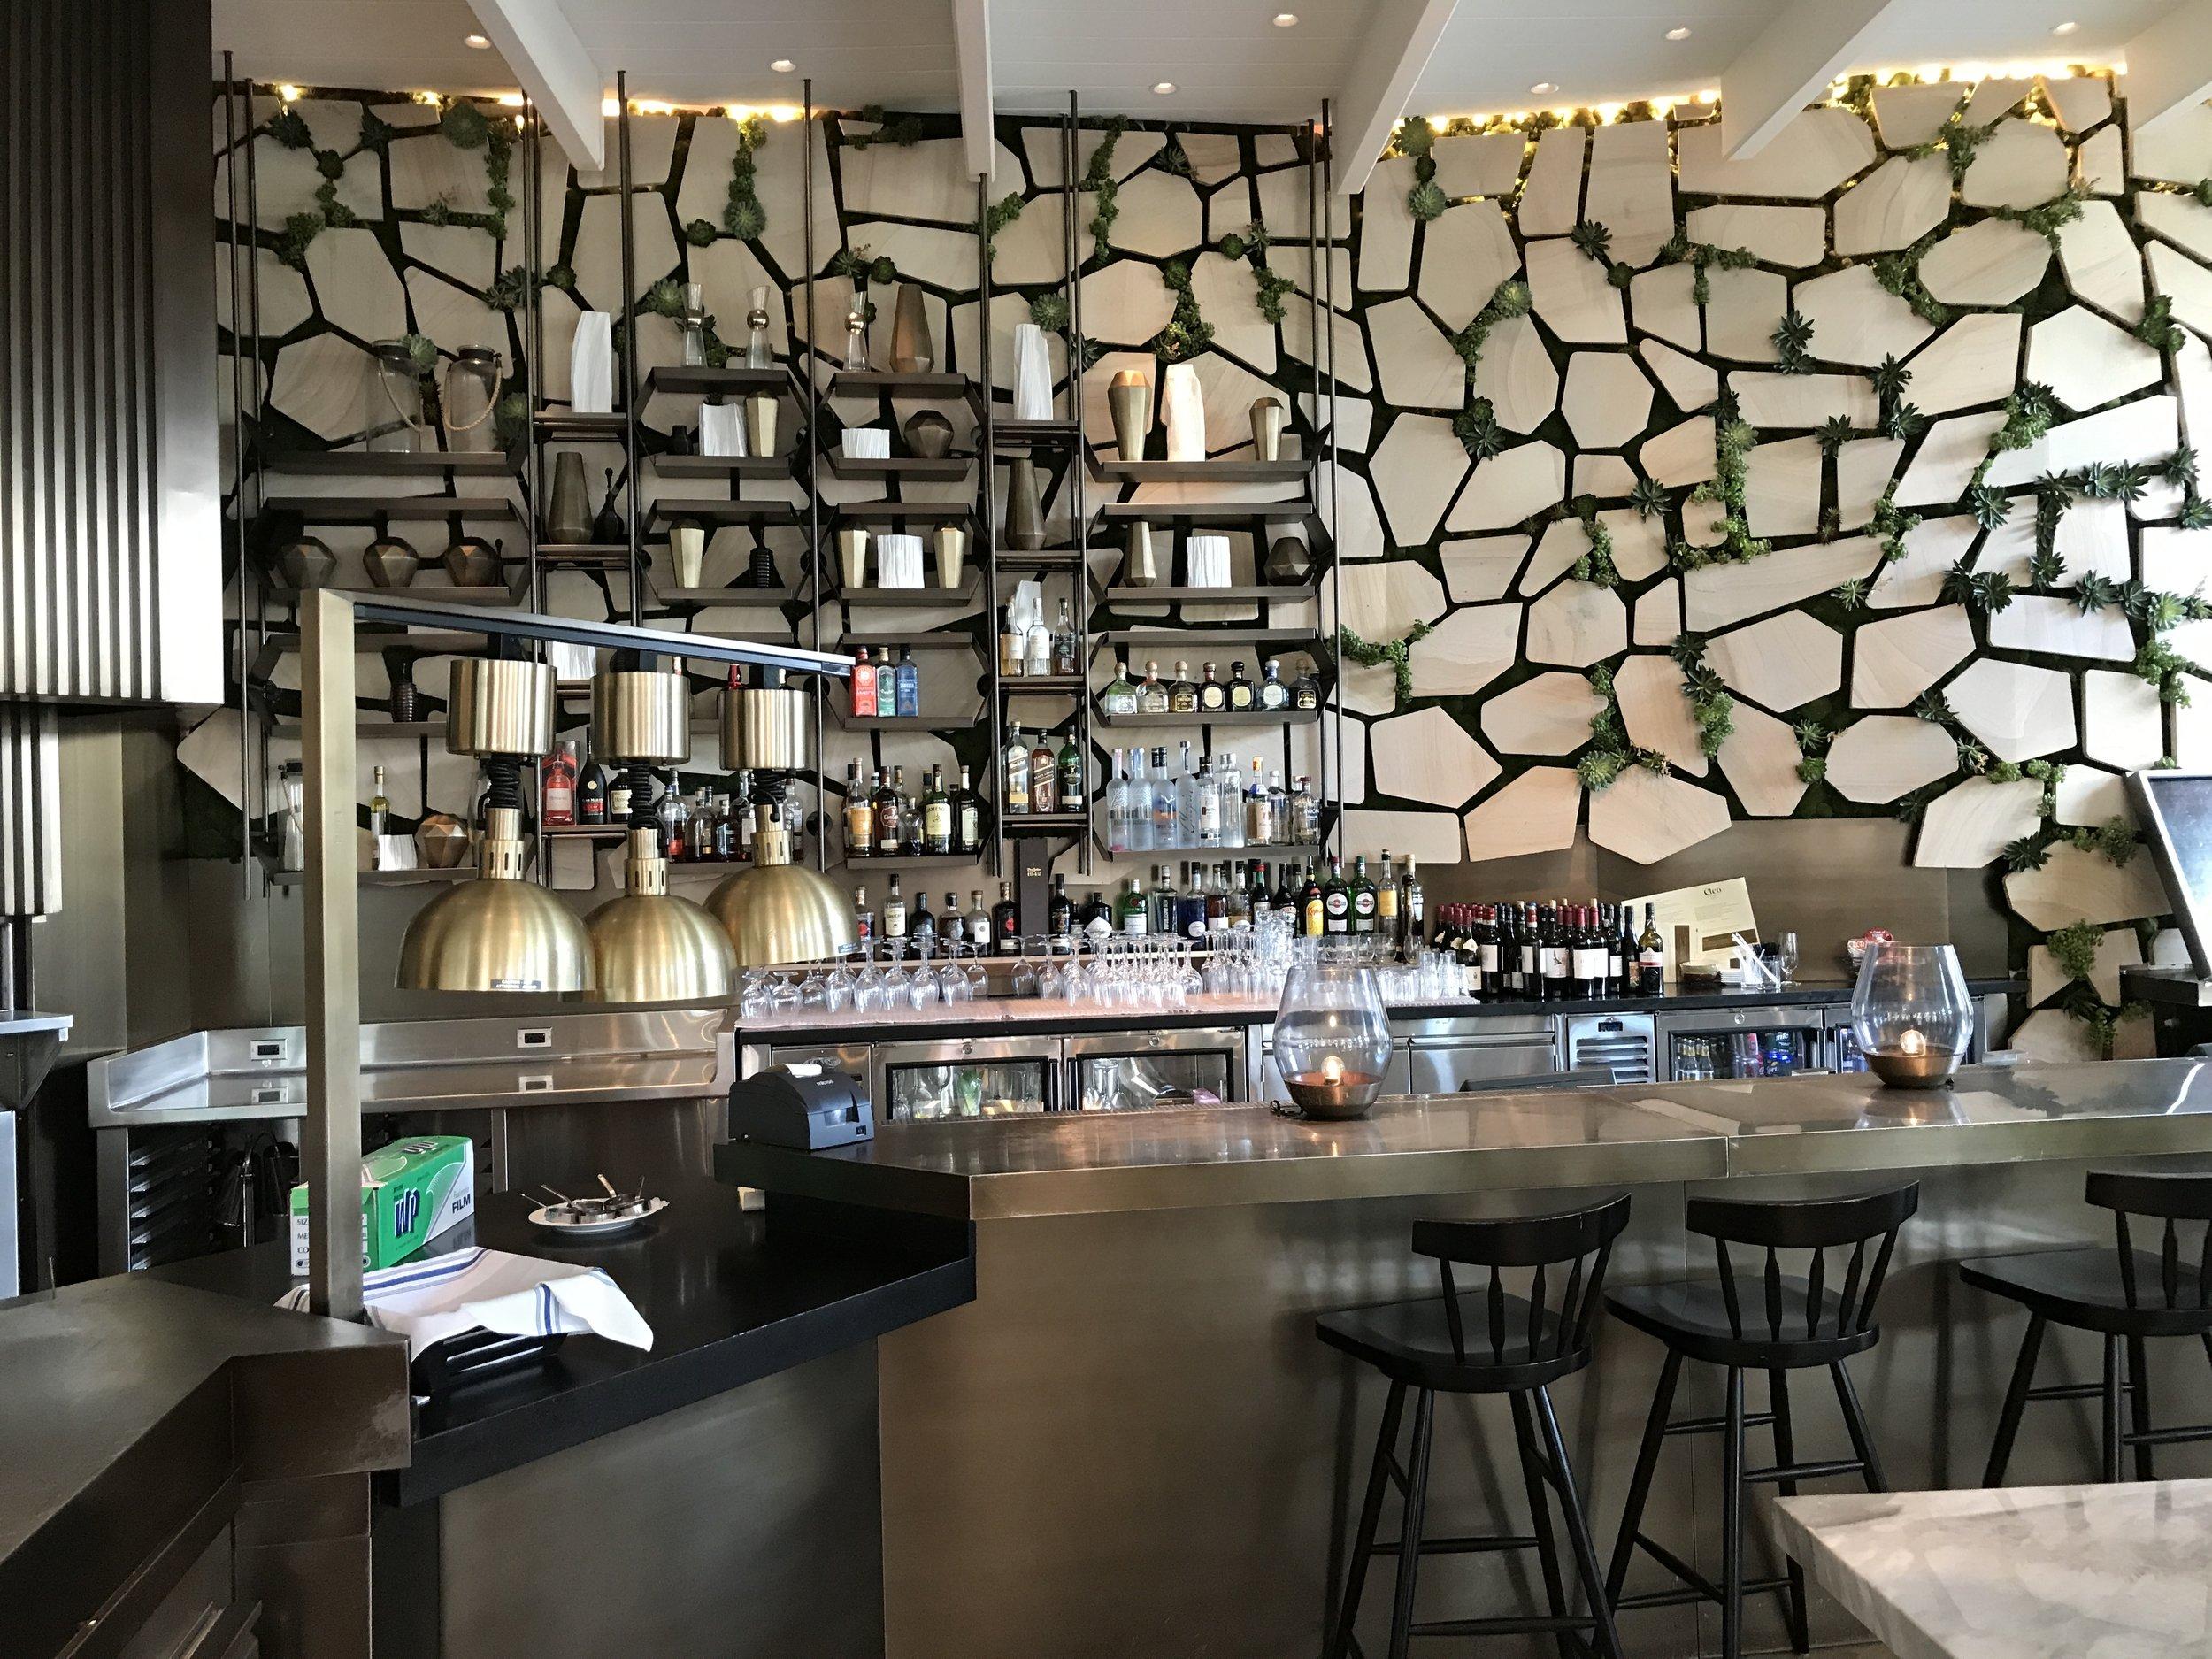 Cleo Restaurant_PDG_Tenant Improvement6.JPG